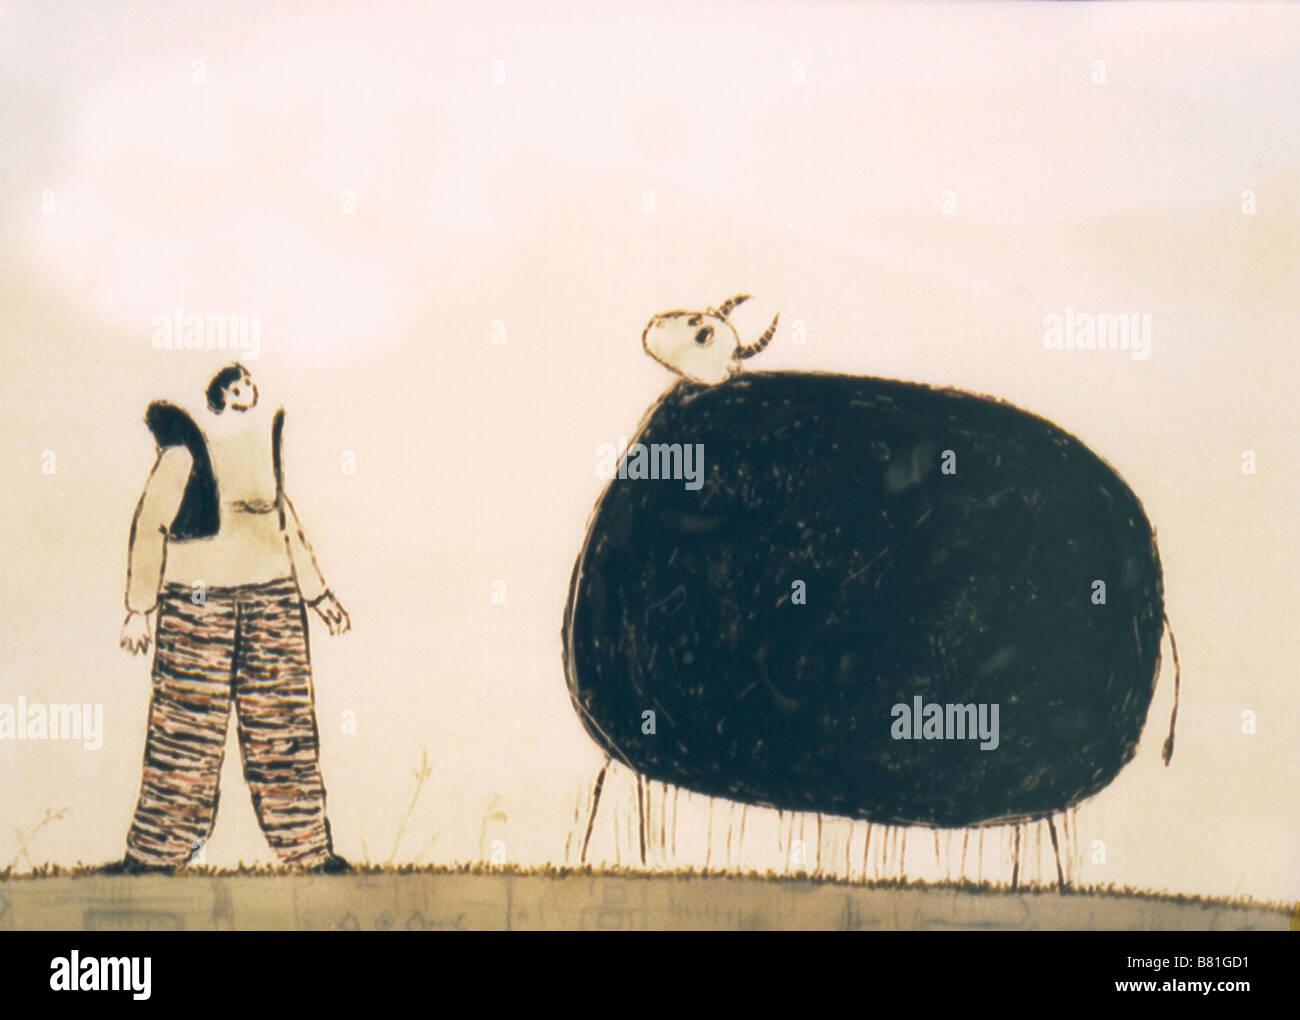 Contes Persans La vache et le fermier Keshavarz va Gav  Year: 2003 - Iran Director: Fatemeh Goudarzi Animation Stock Photo